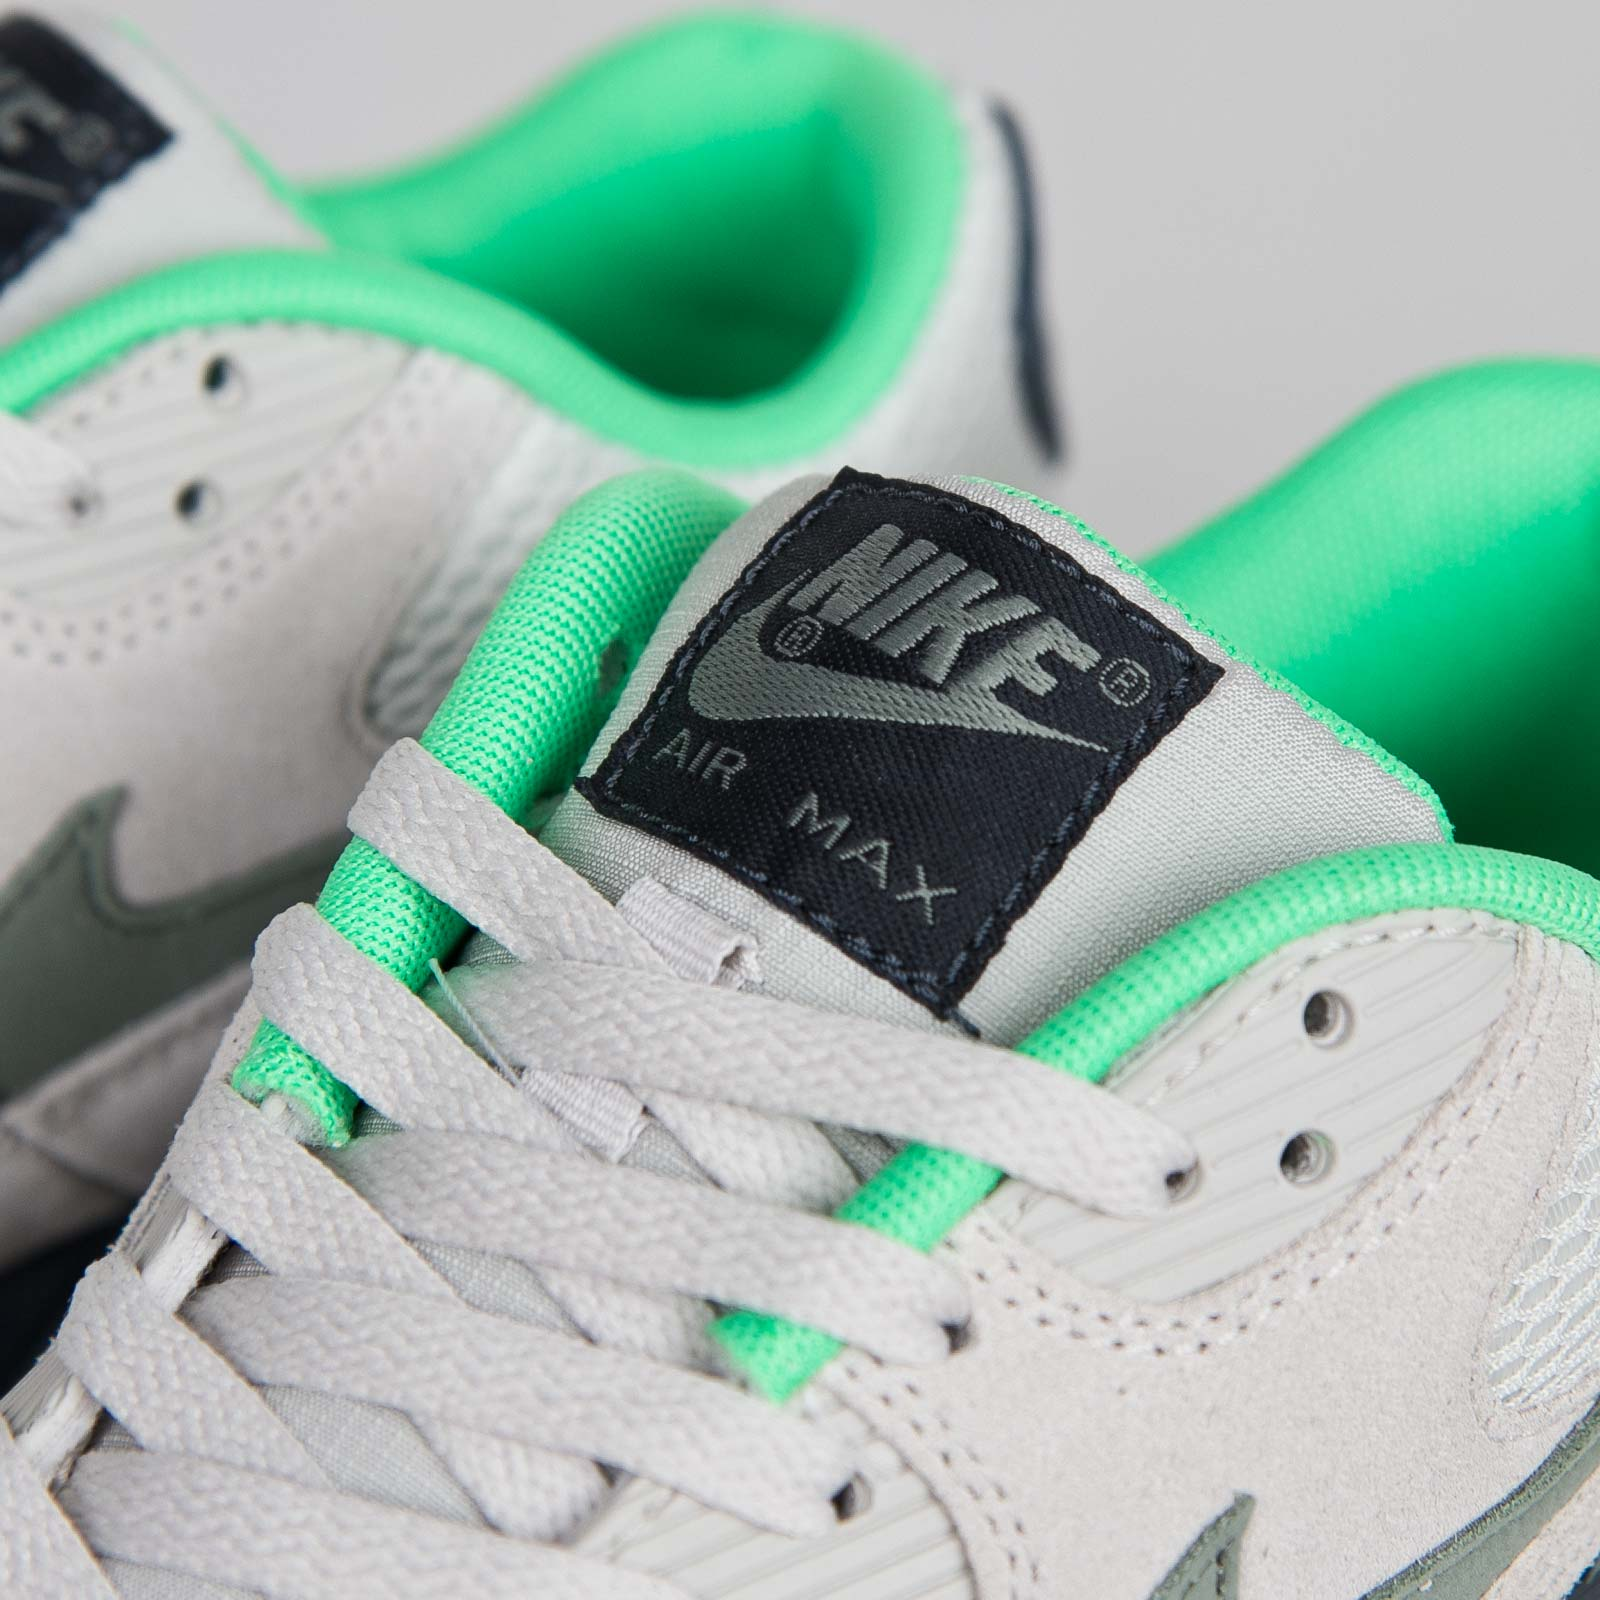 hot sale online 0bfd8 e790b Nike Air Max 90 Essential - 537384-043 - Sneakersnstuff   sneakers    streetwear online since 1999